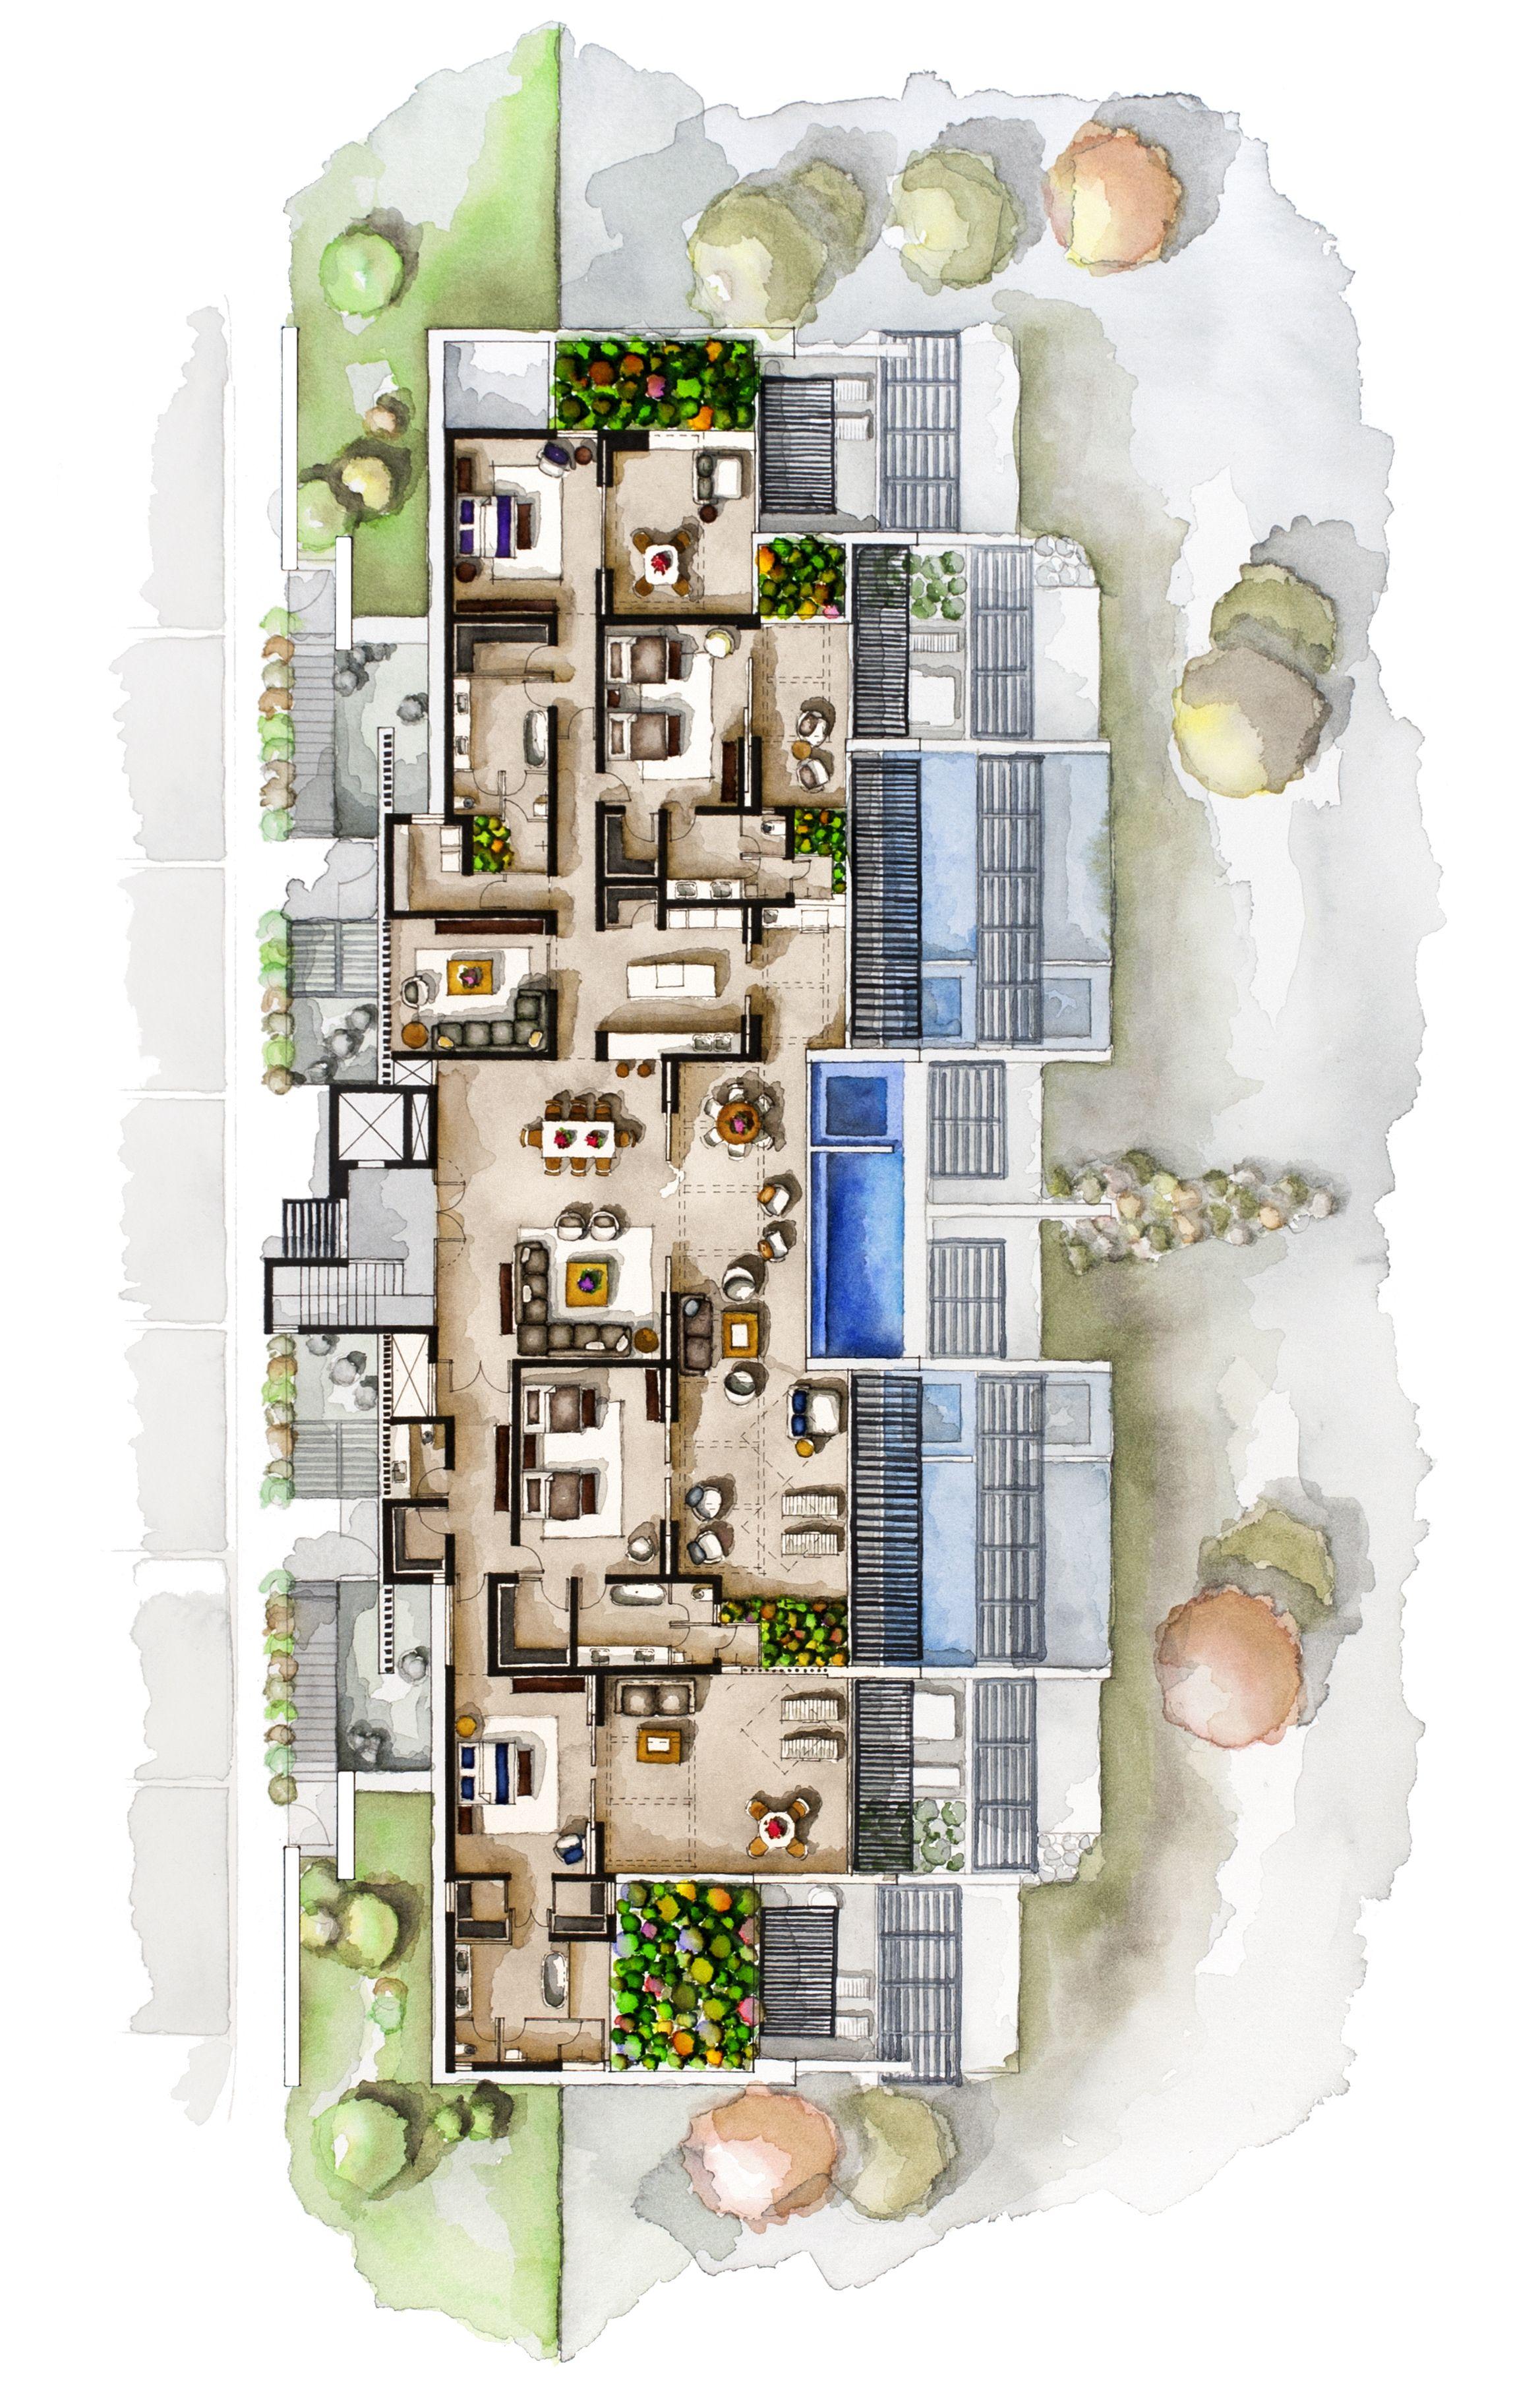 7 Rendering Floor Plans Elevations Interior Design Sketches